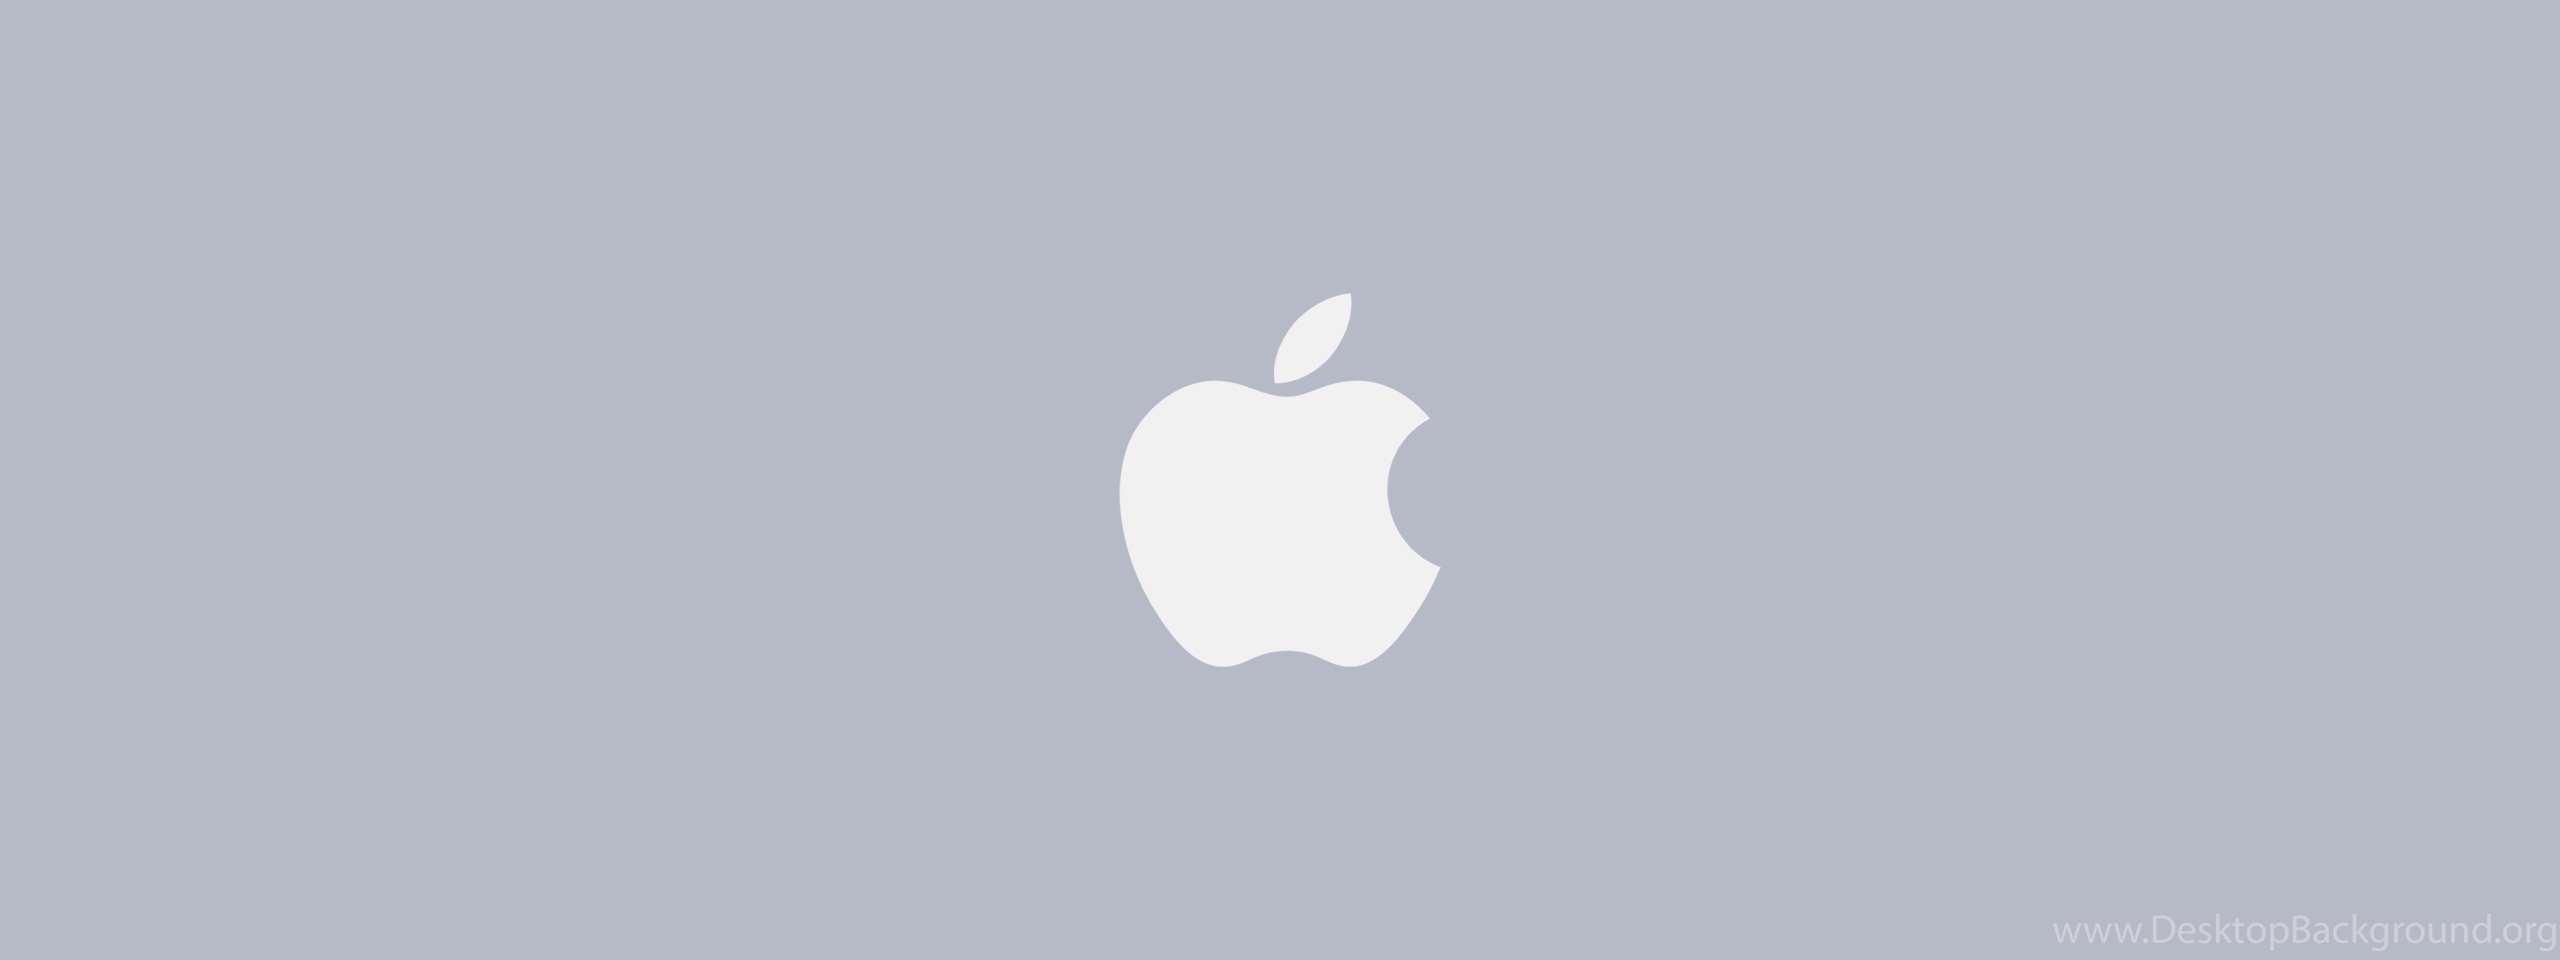 Apple logo wallpaper macbook 171 50742 ...